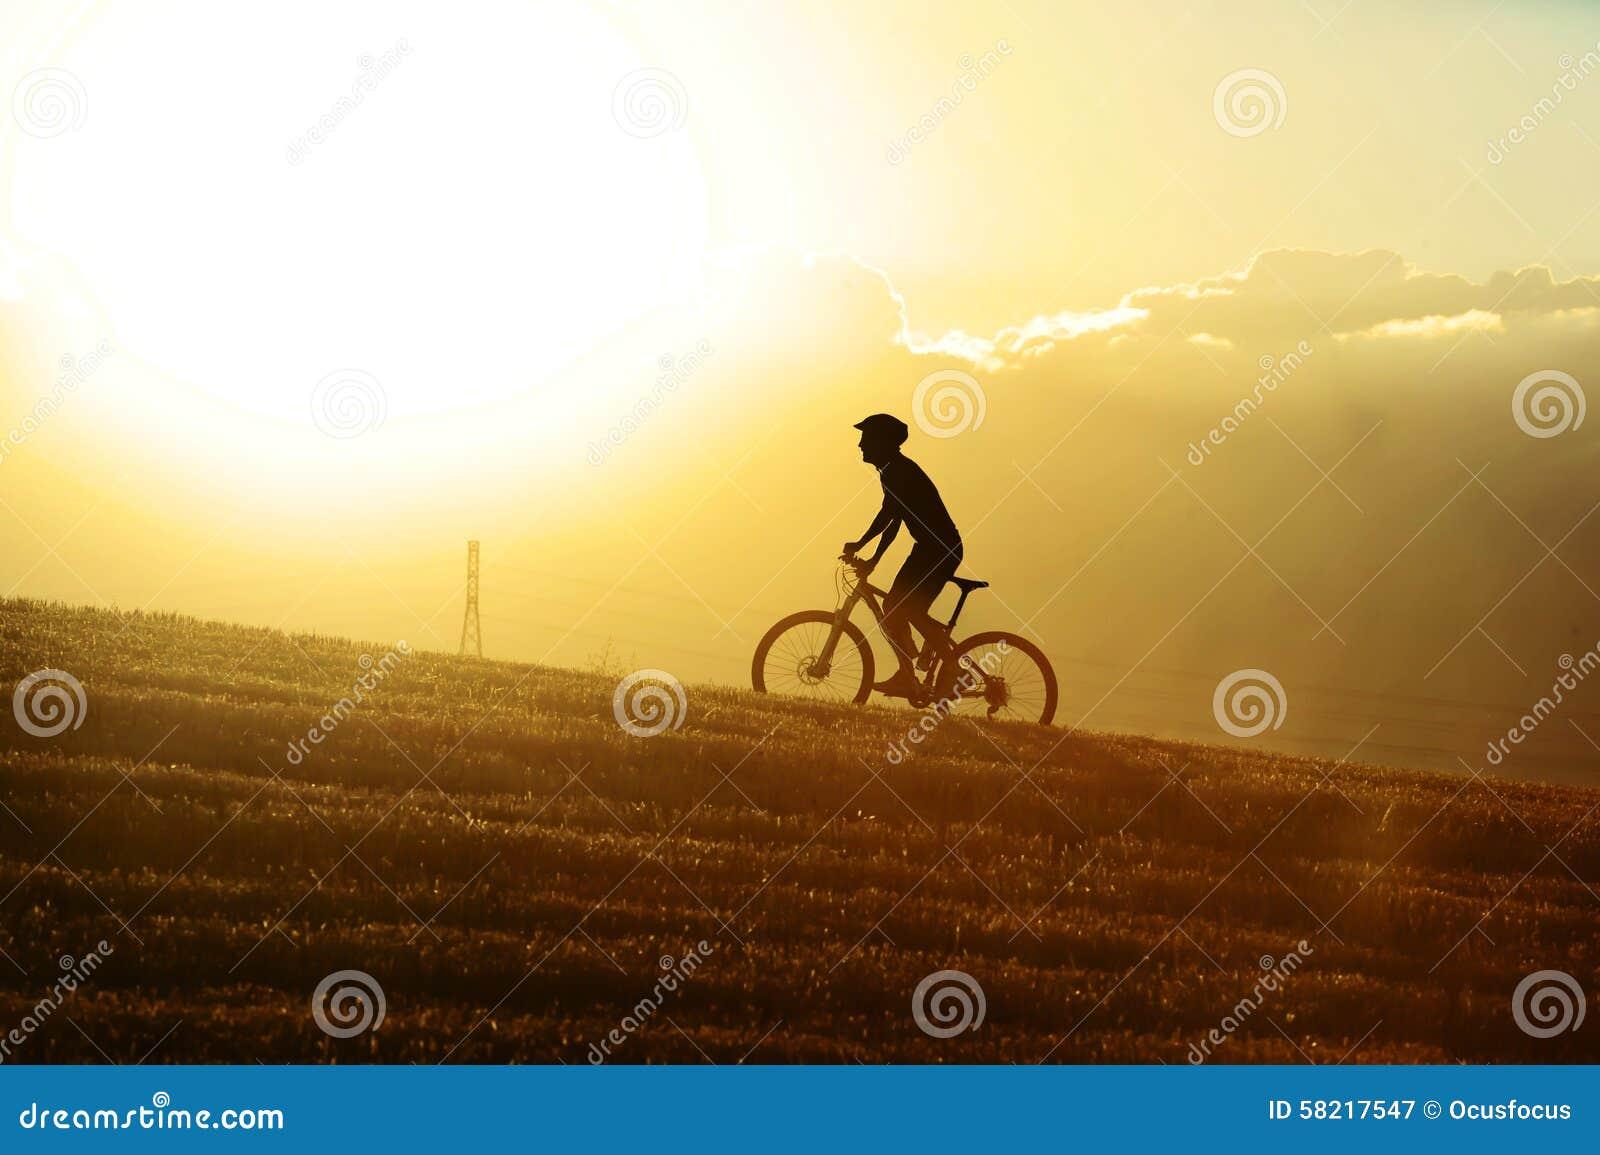 Profile silhouette sport man cycling uphilll riding cross country mountain bike